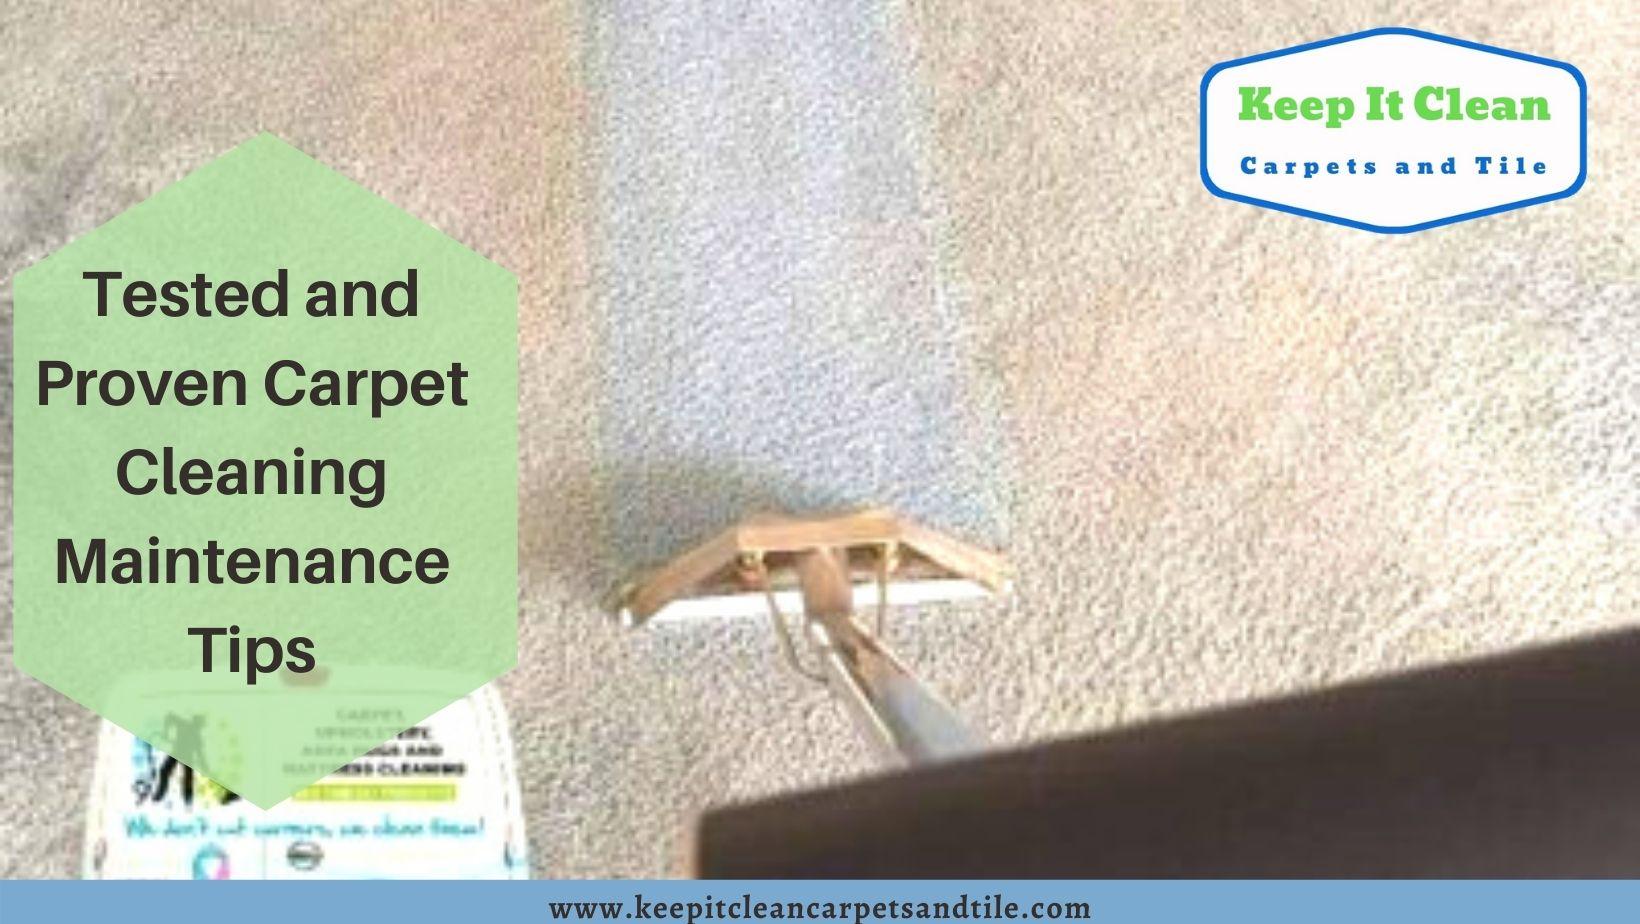 Carpet Cleaning Maintenance Miami